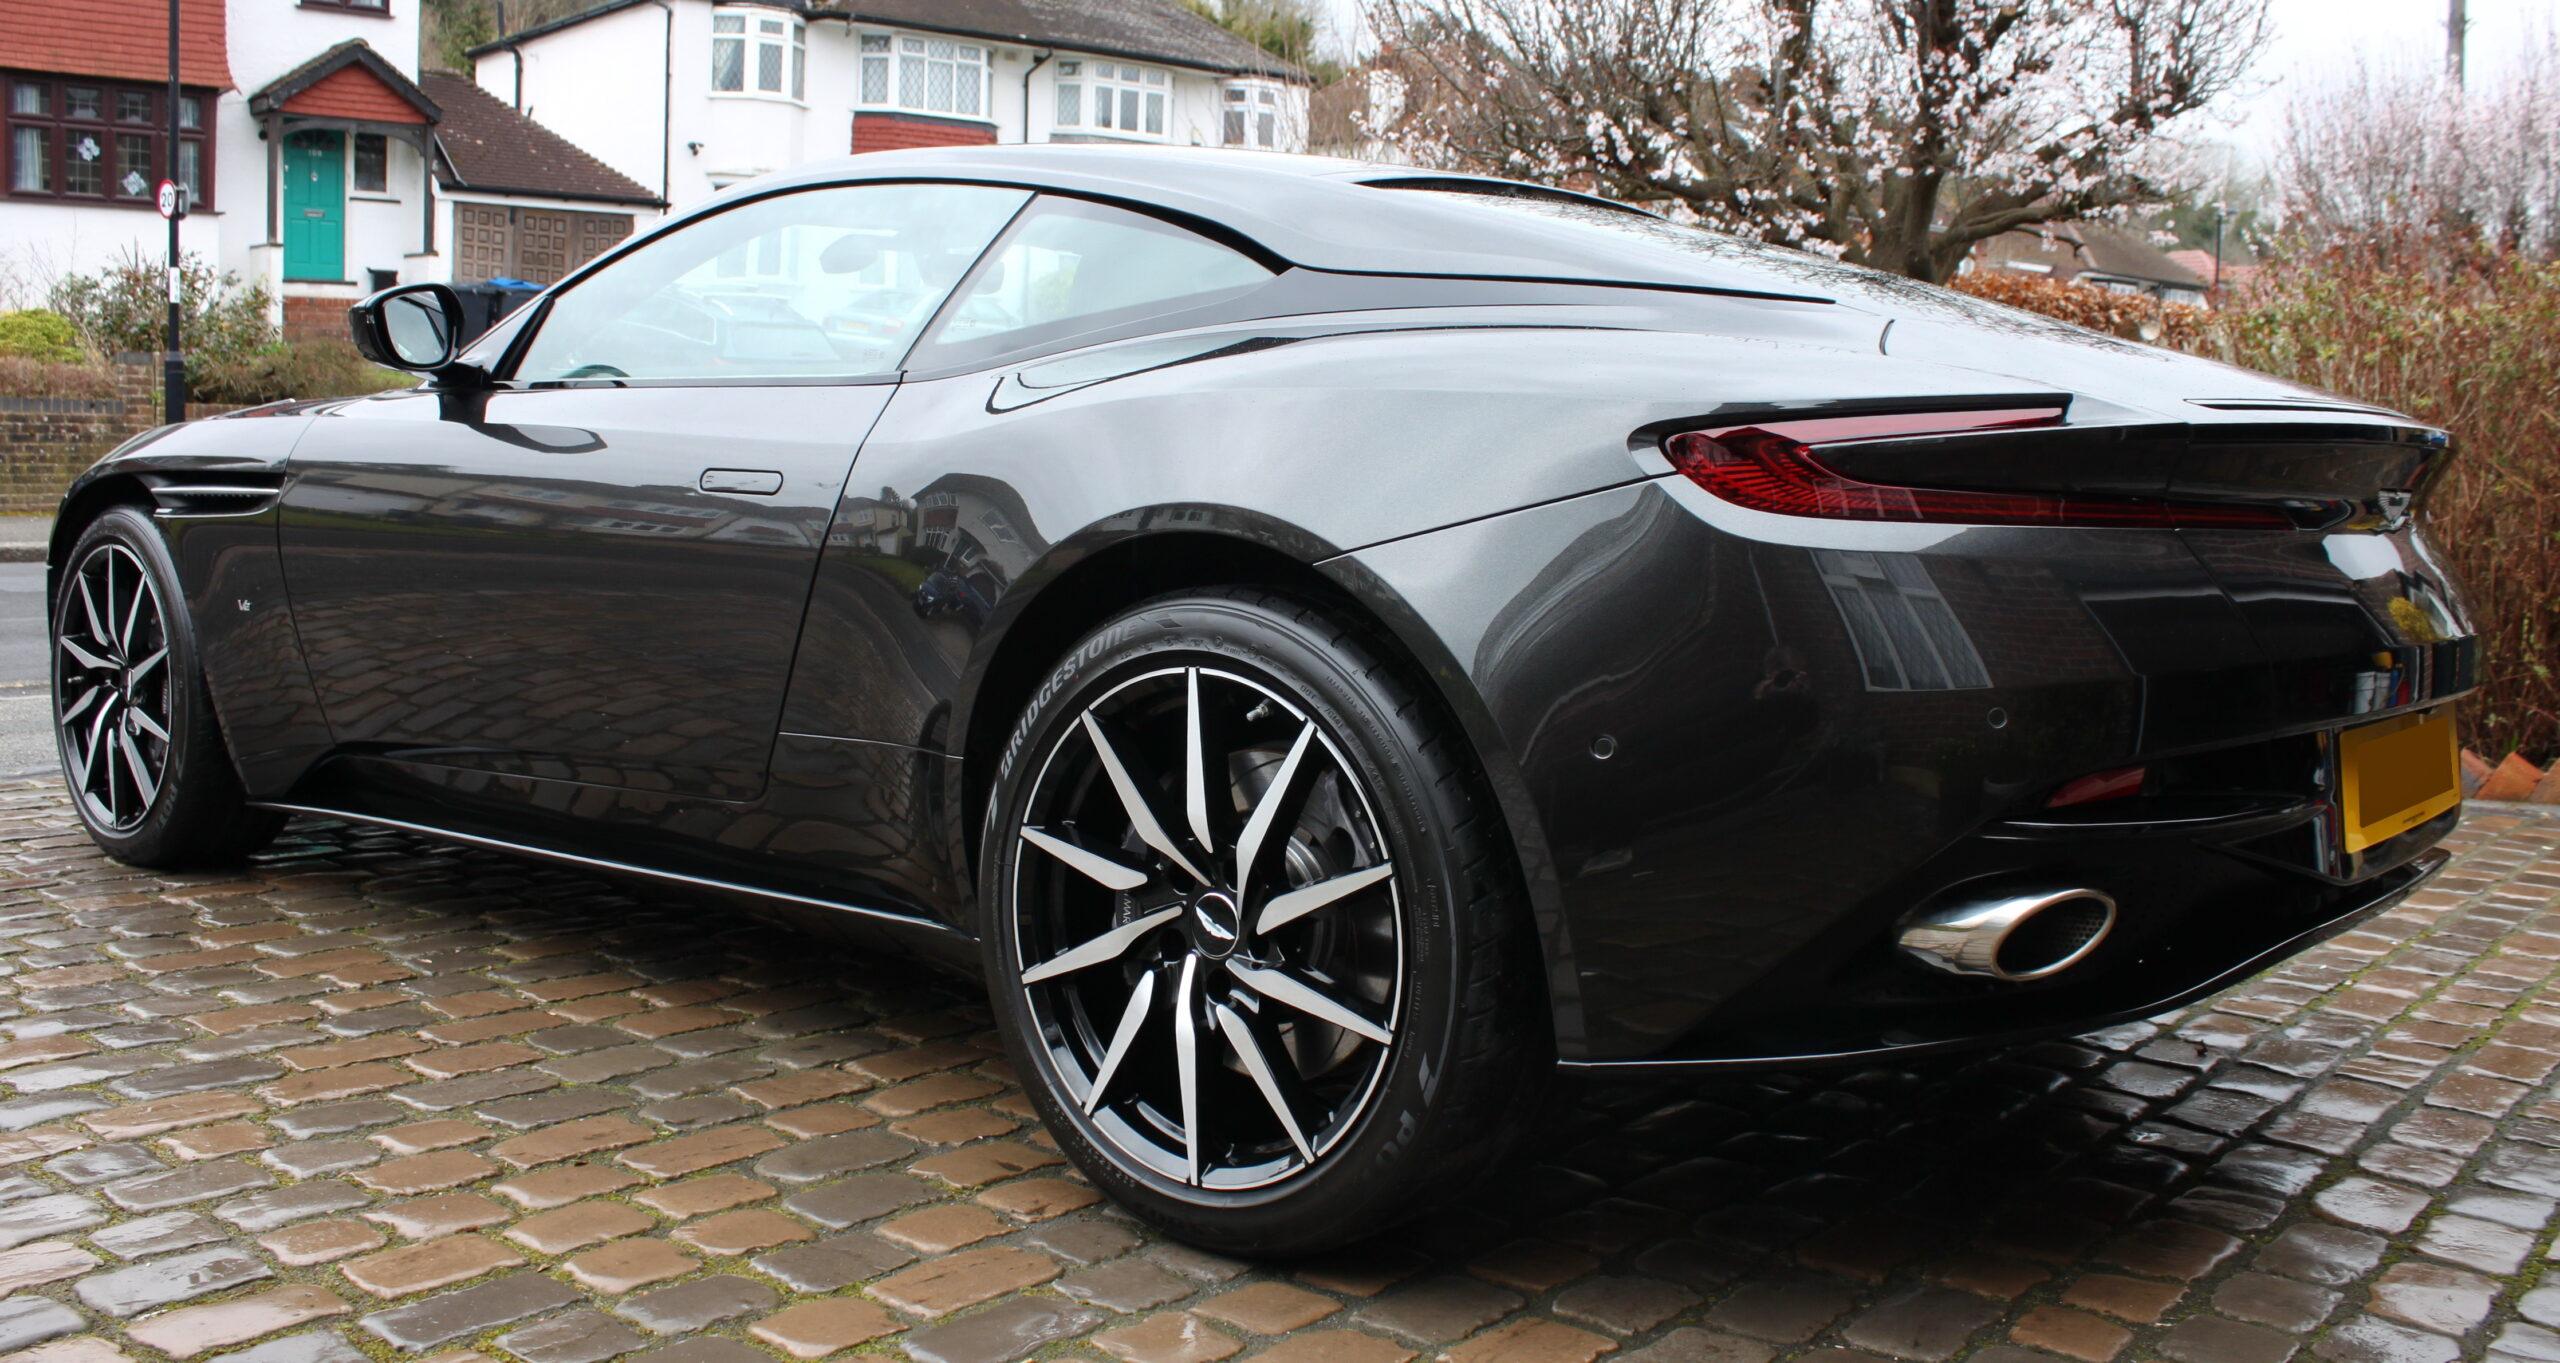 Aston Martin DB11 detailed